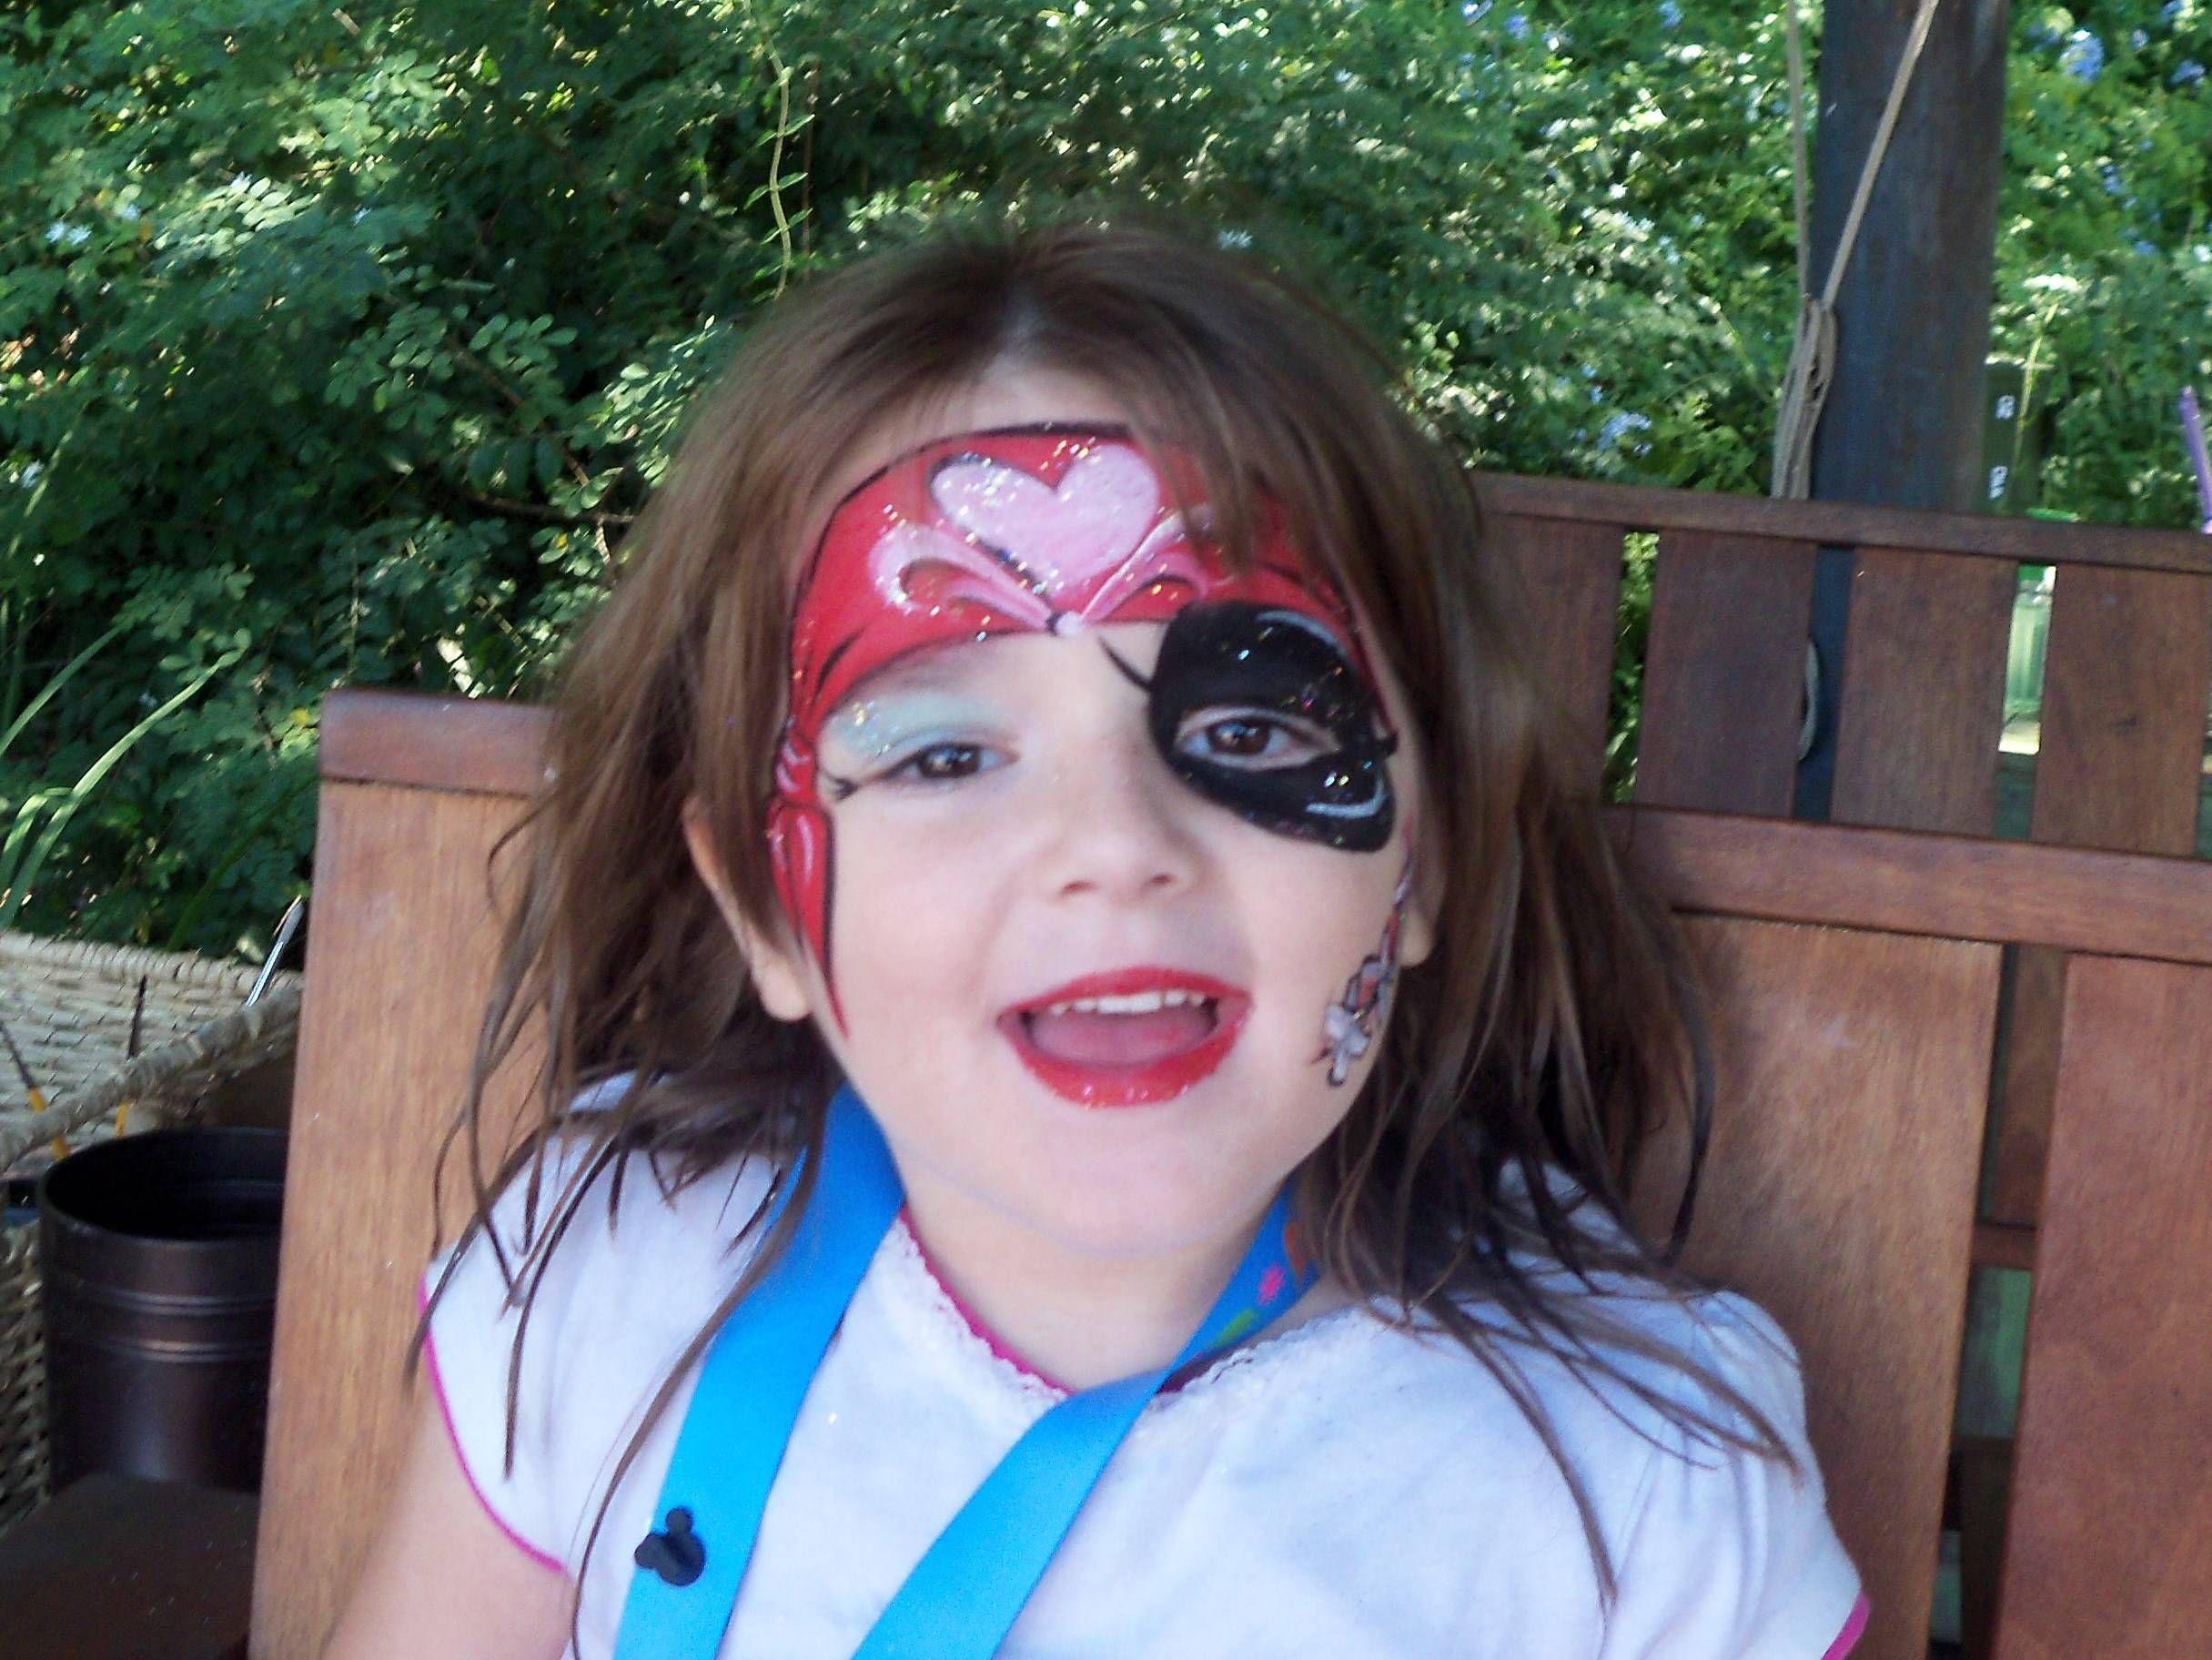 Trucco pirata bambina